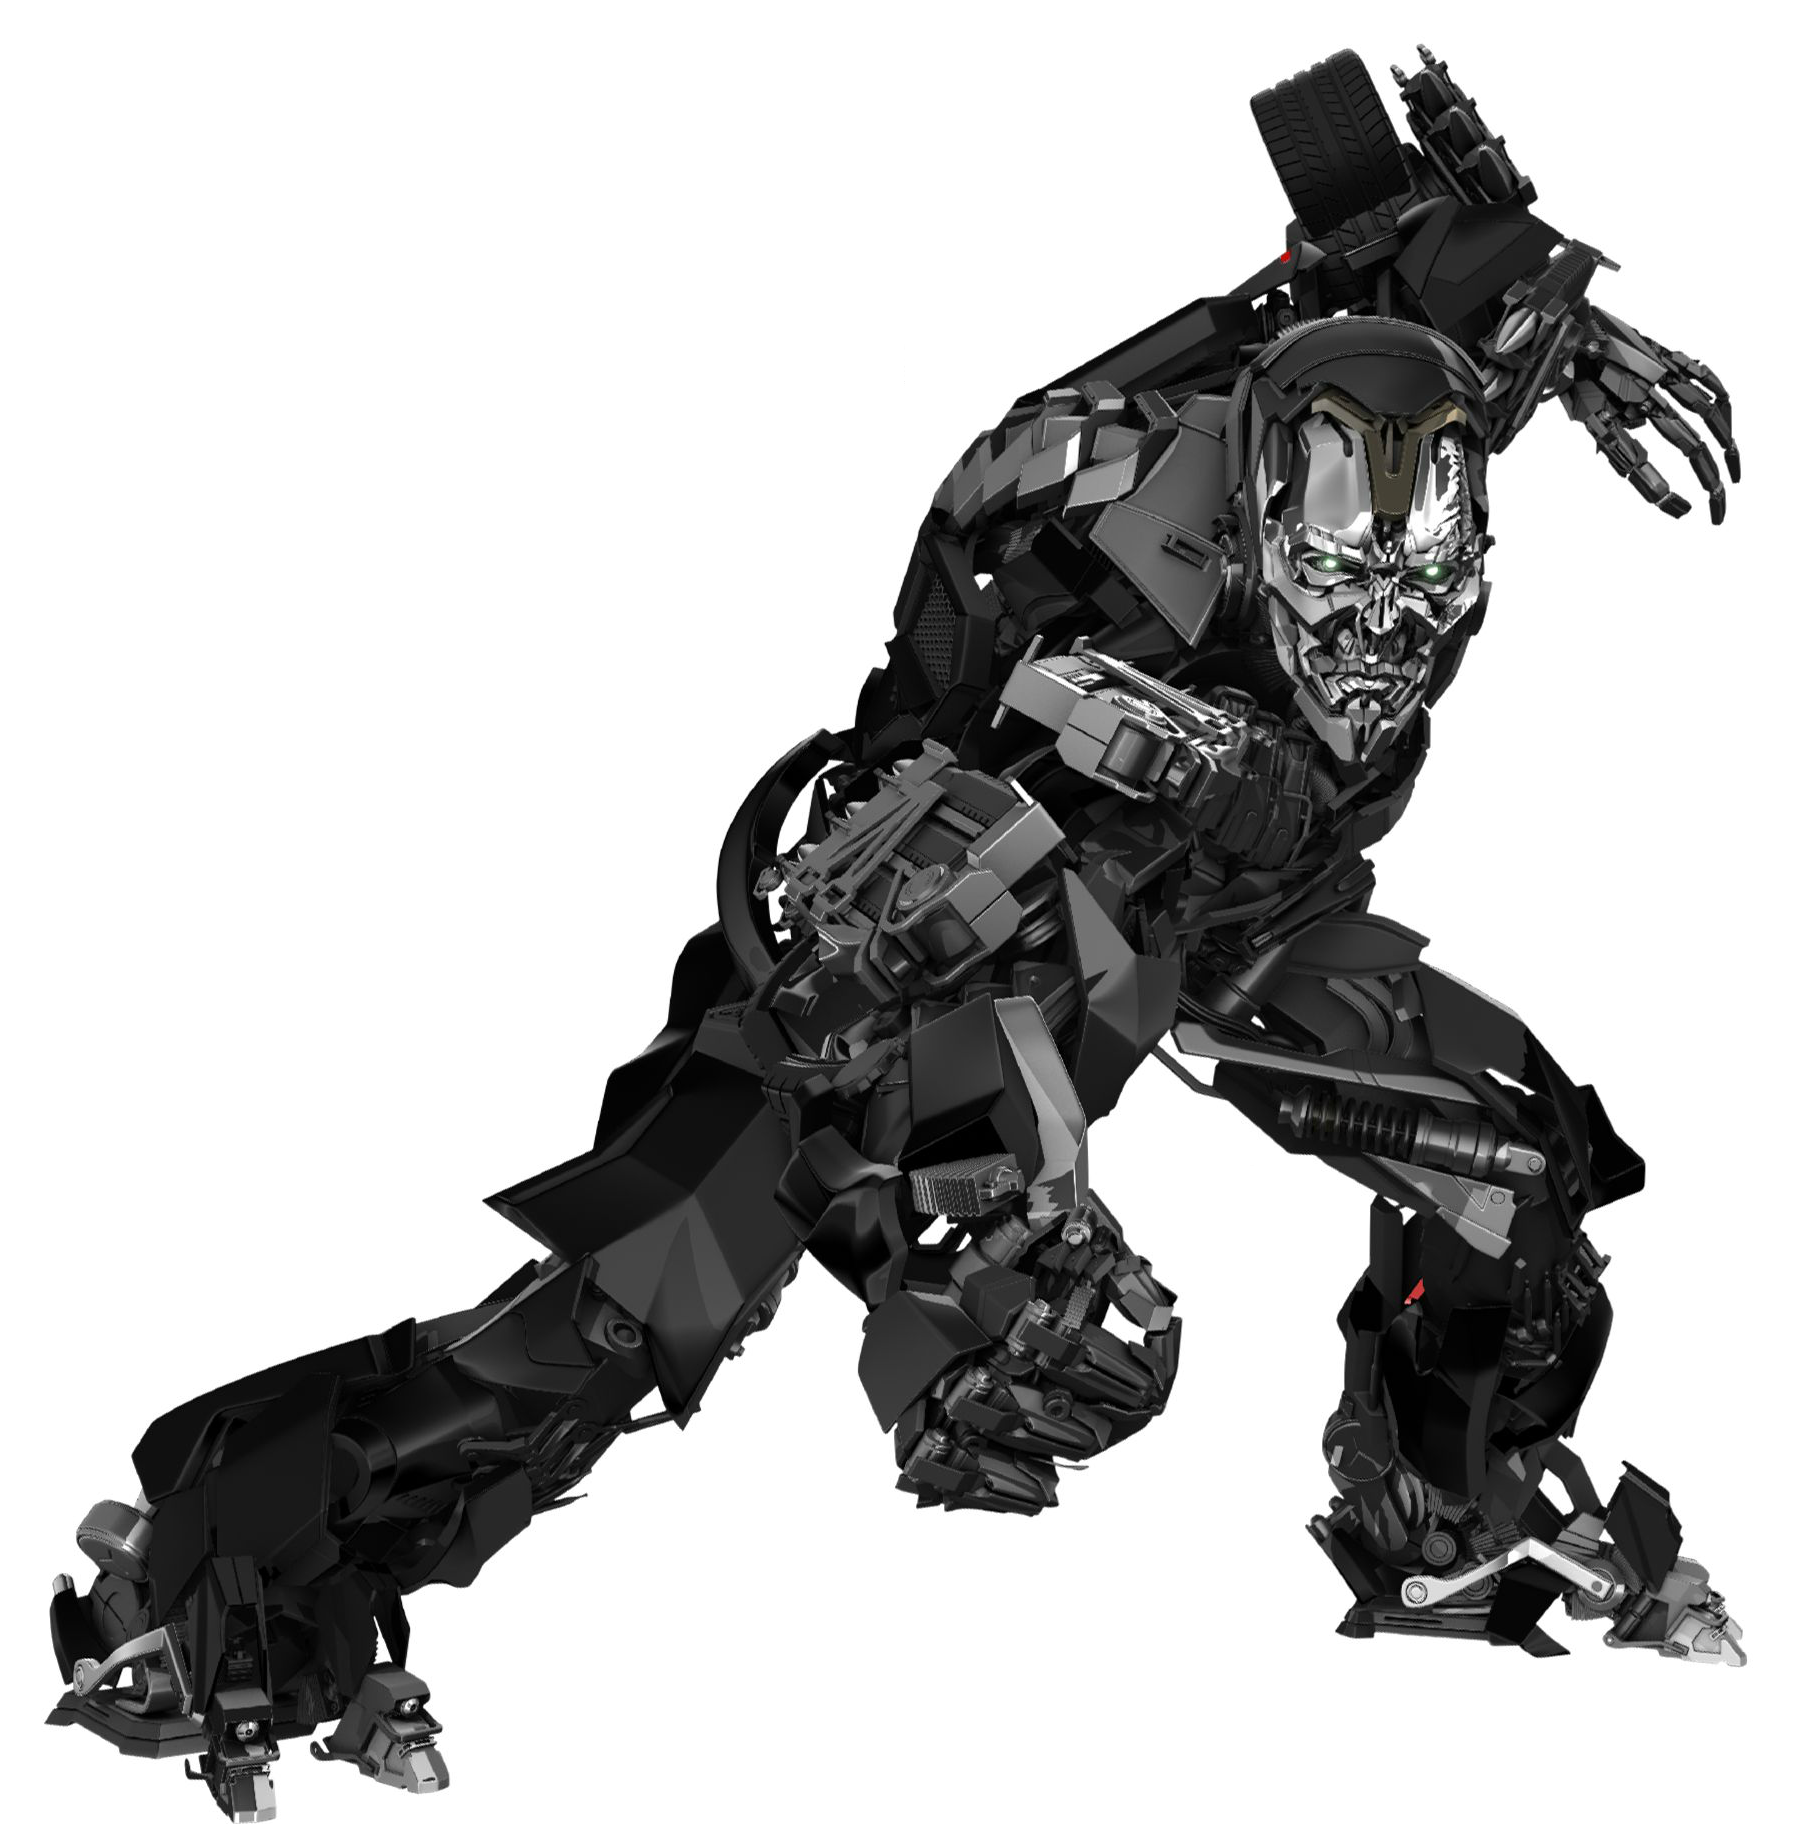 Lockdown (Transformers Film Series) | Villains Wiki ...